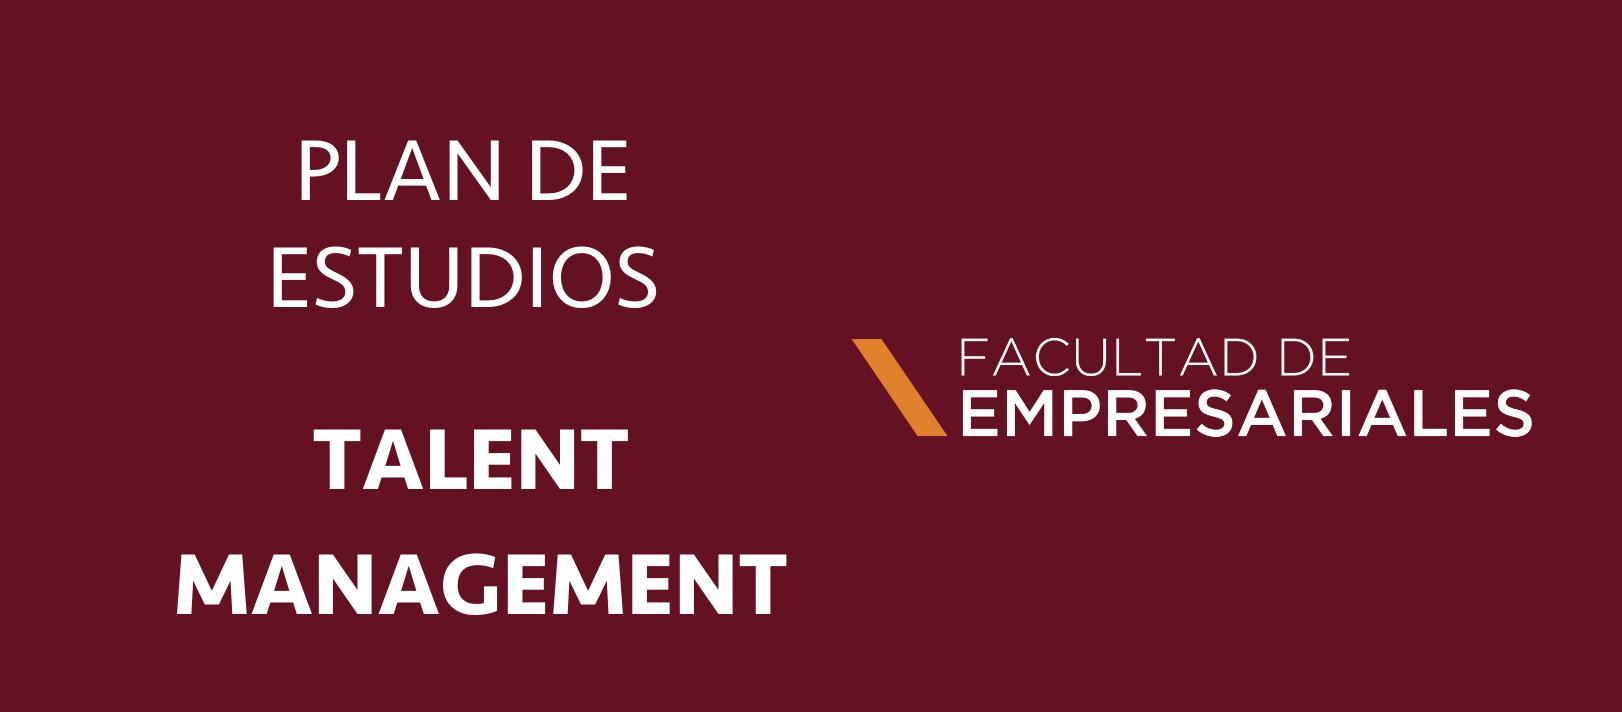 plan de estudios de talent management recursos humanos en la universidad panamericana